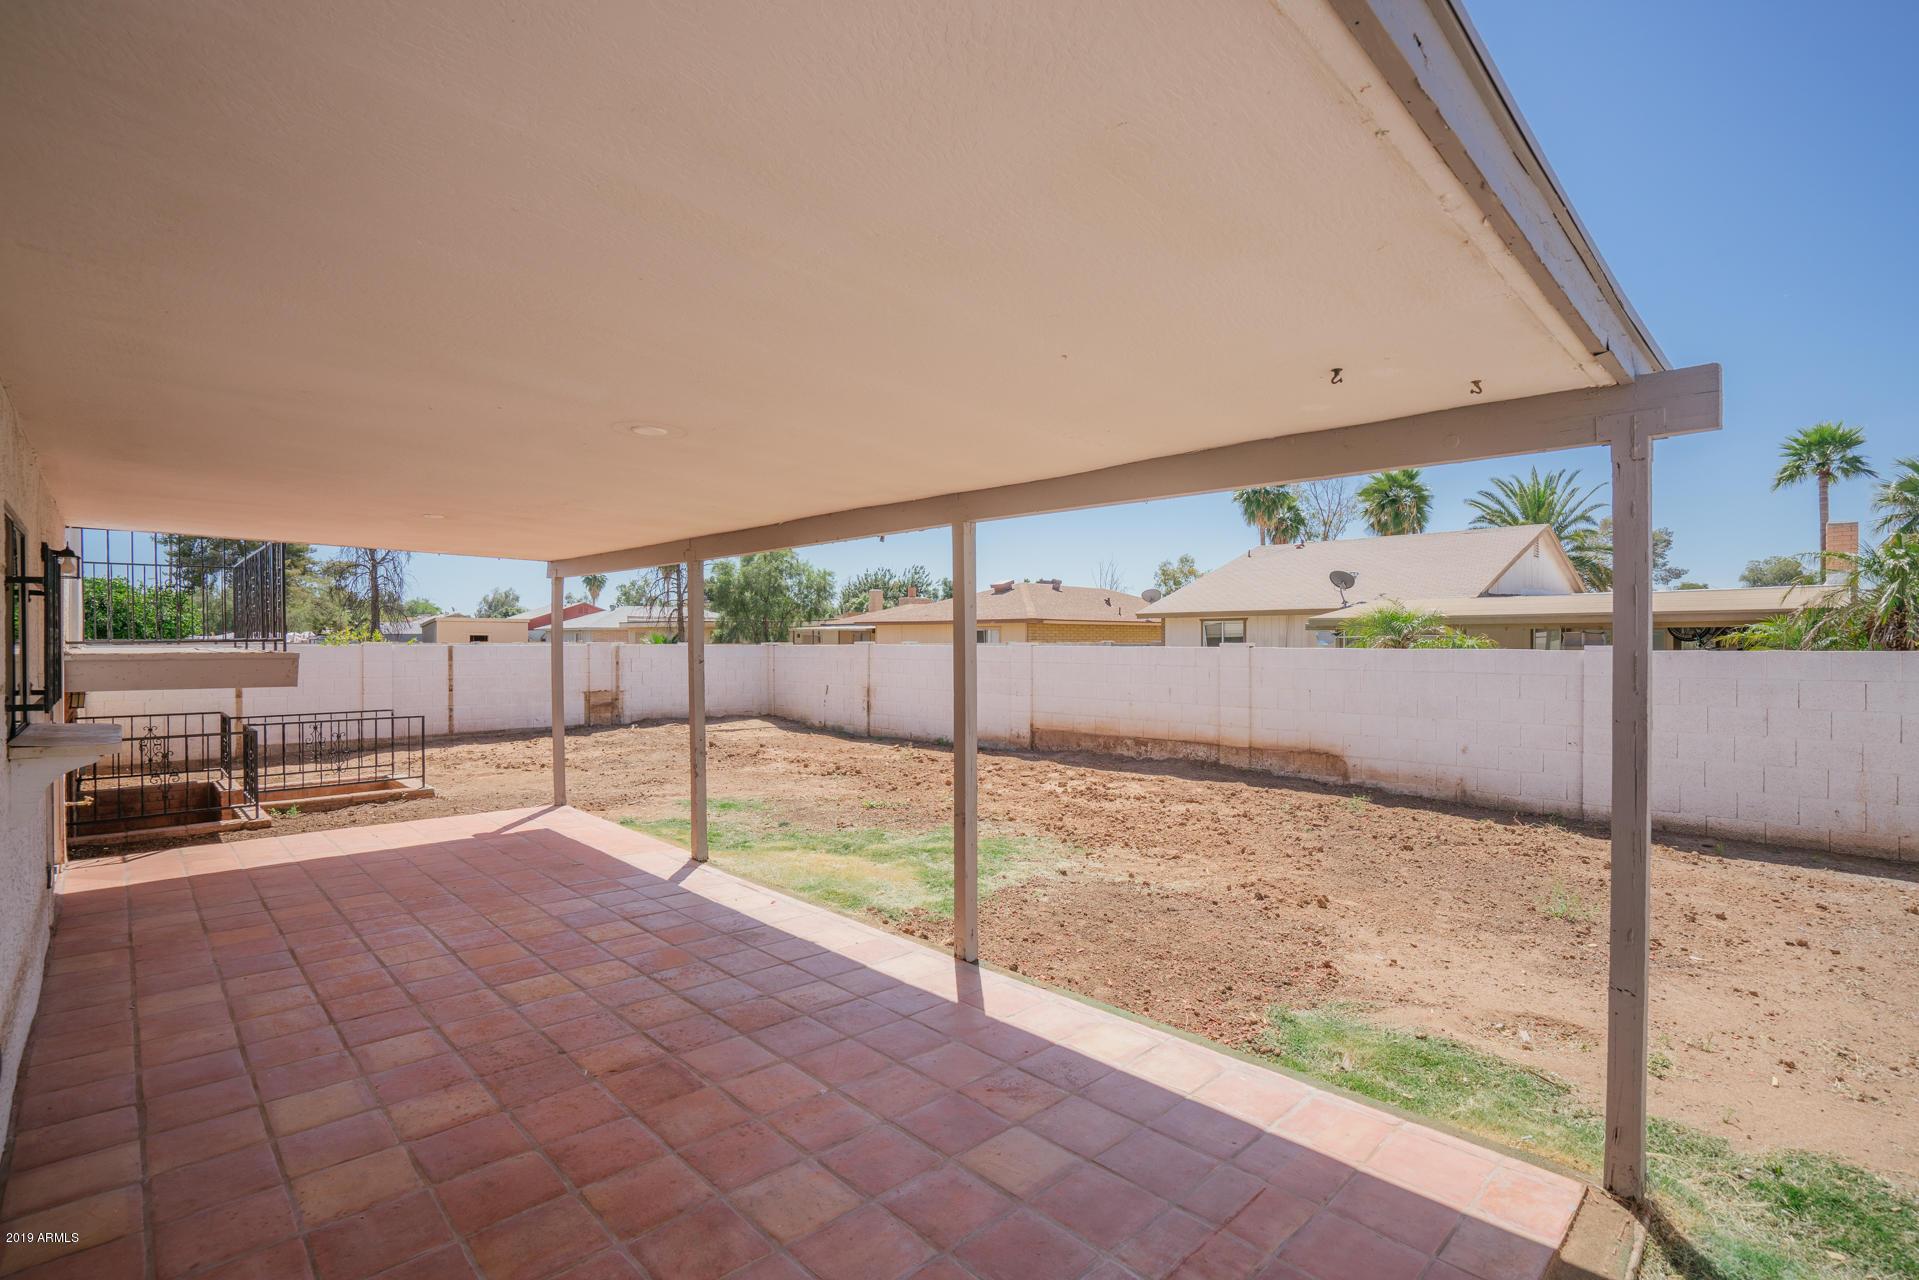 MLS 5914009 10423 W CALLE DE PLATA --, Phoenix, AZ 85037 Phoenix AZ Villa de Paz